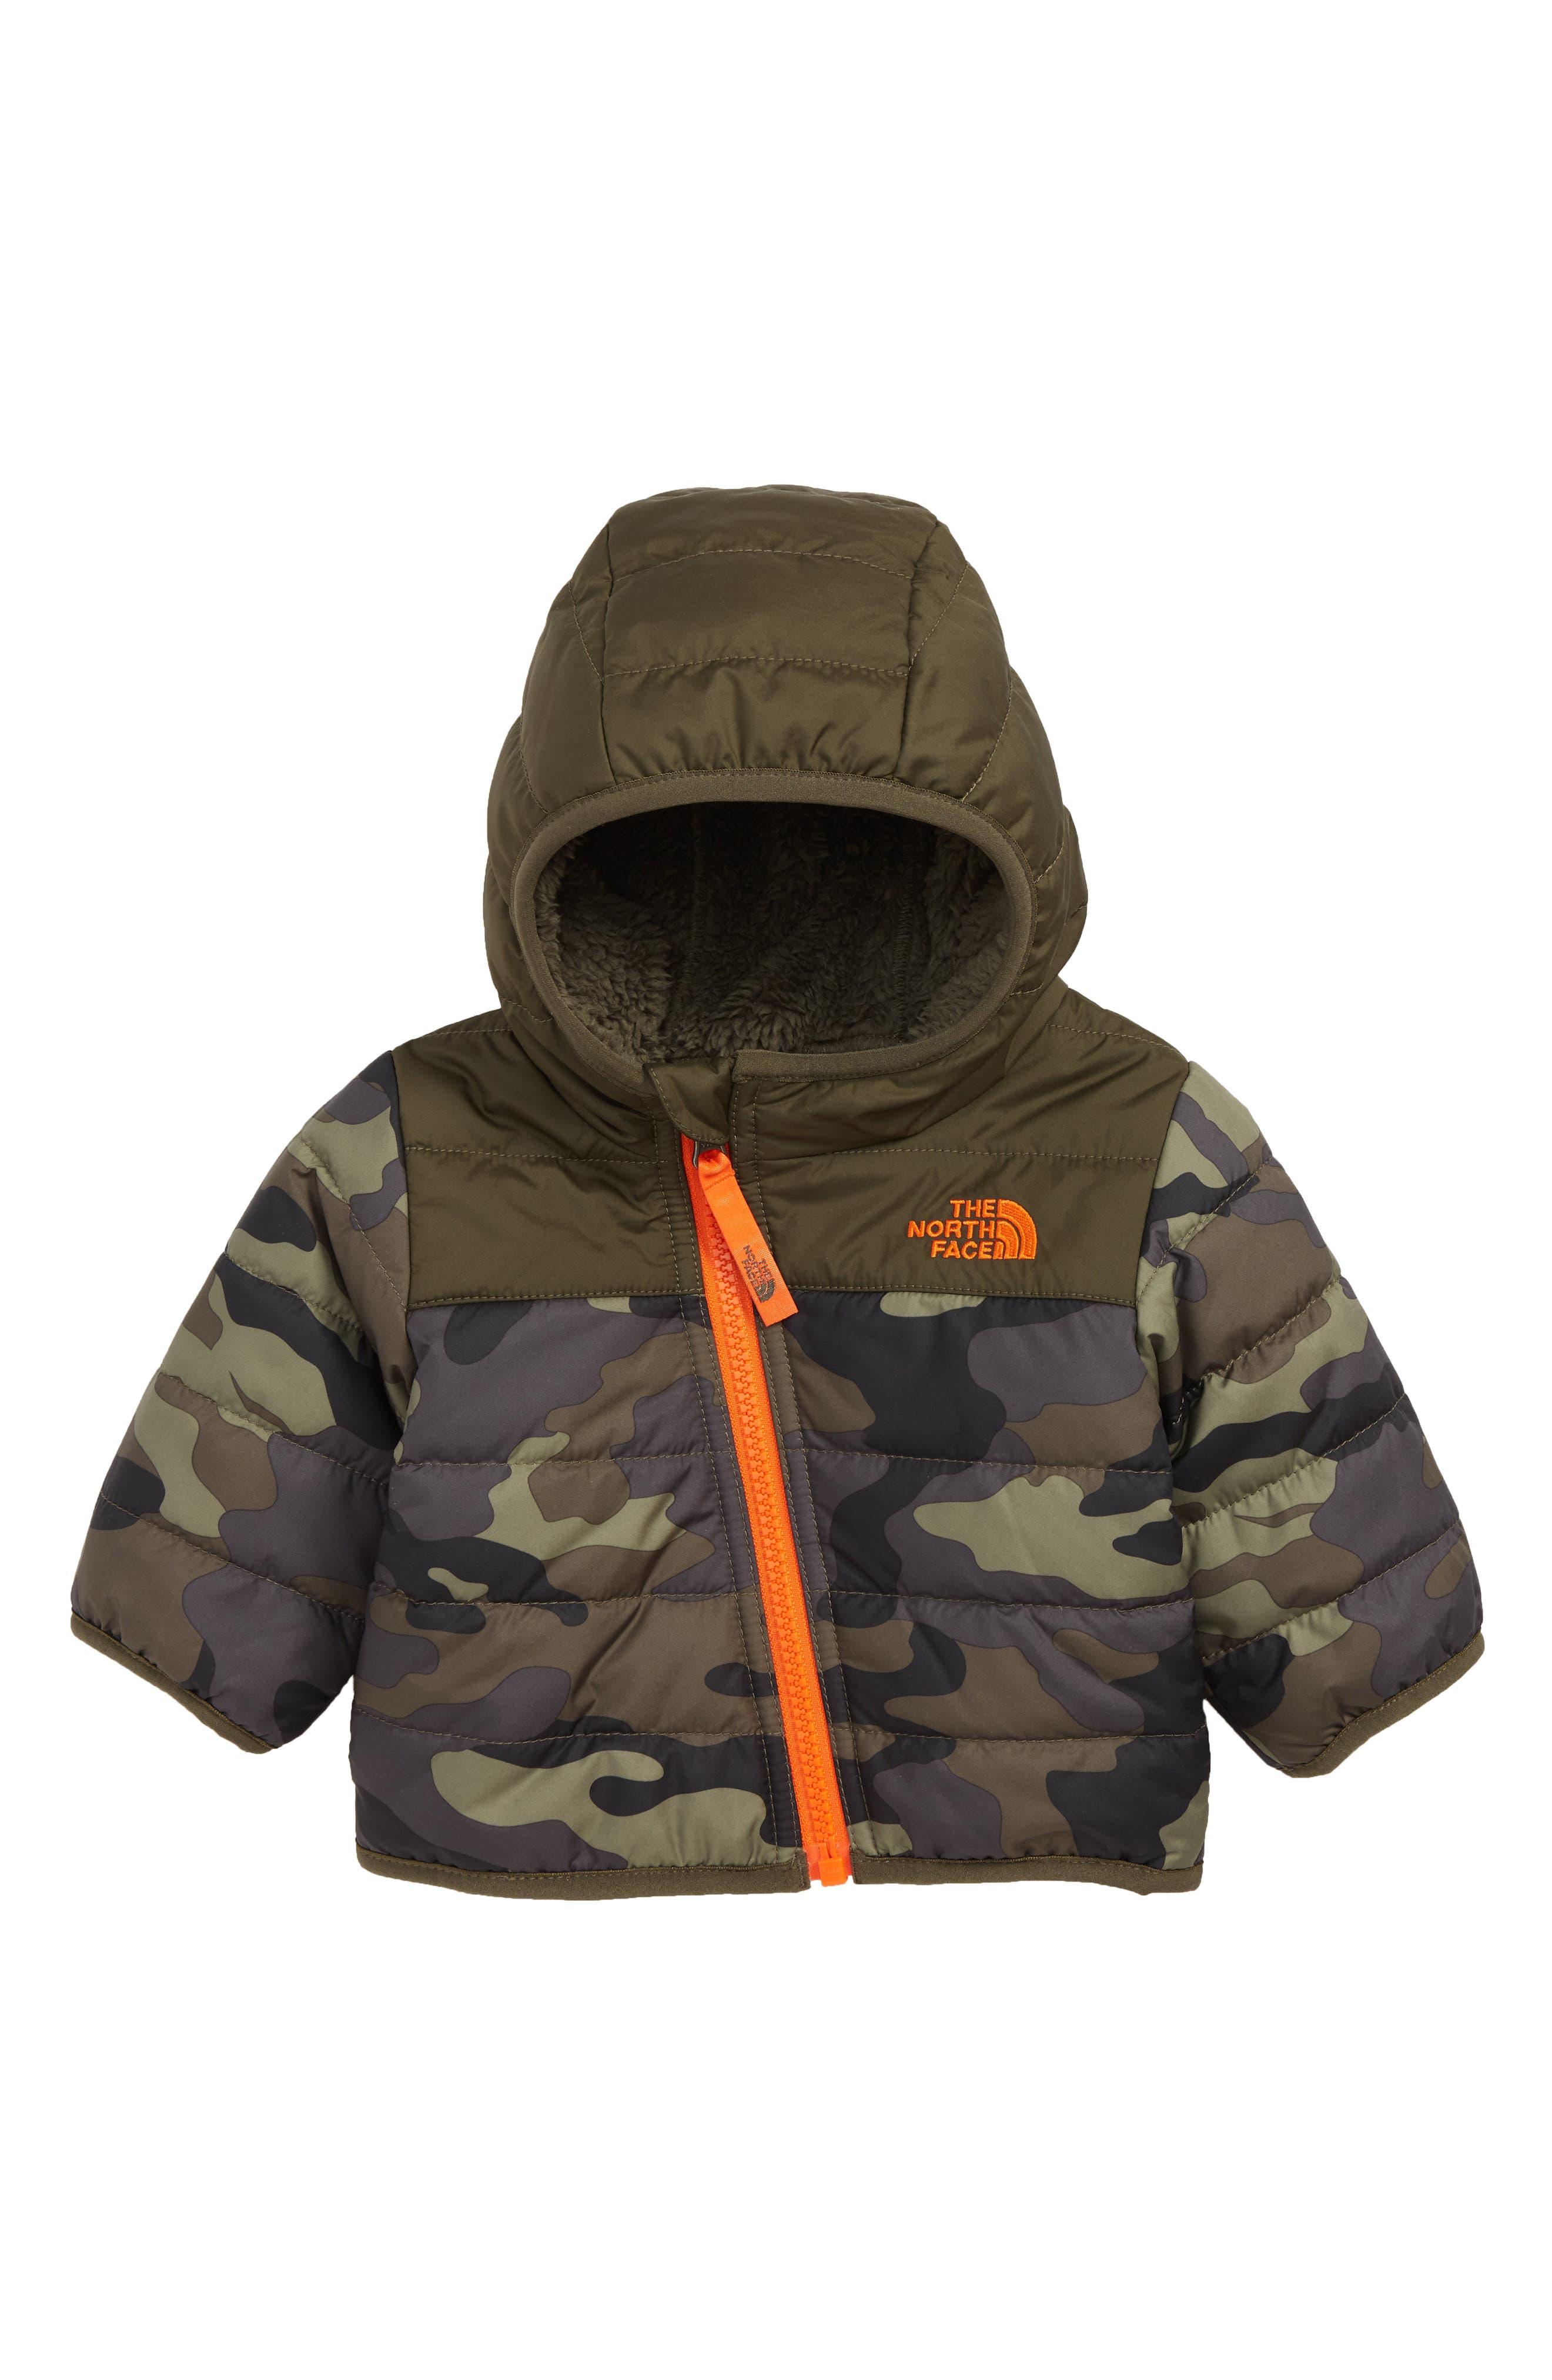 Mount Chimborazo Reversible Jacket,                             Main thumbnail 1, color,                             TAUPE/ GREEN CAMO PRINT